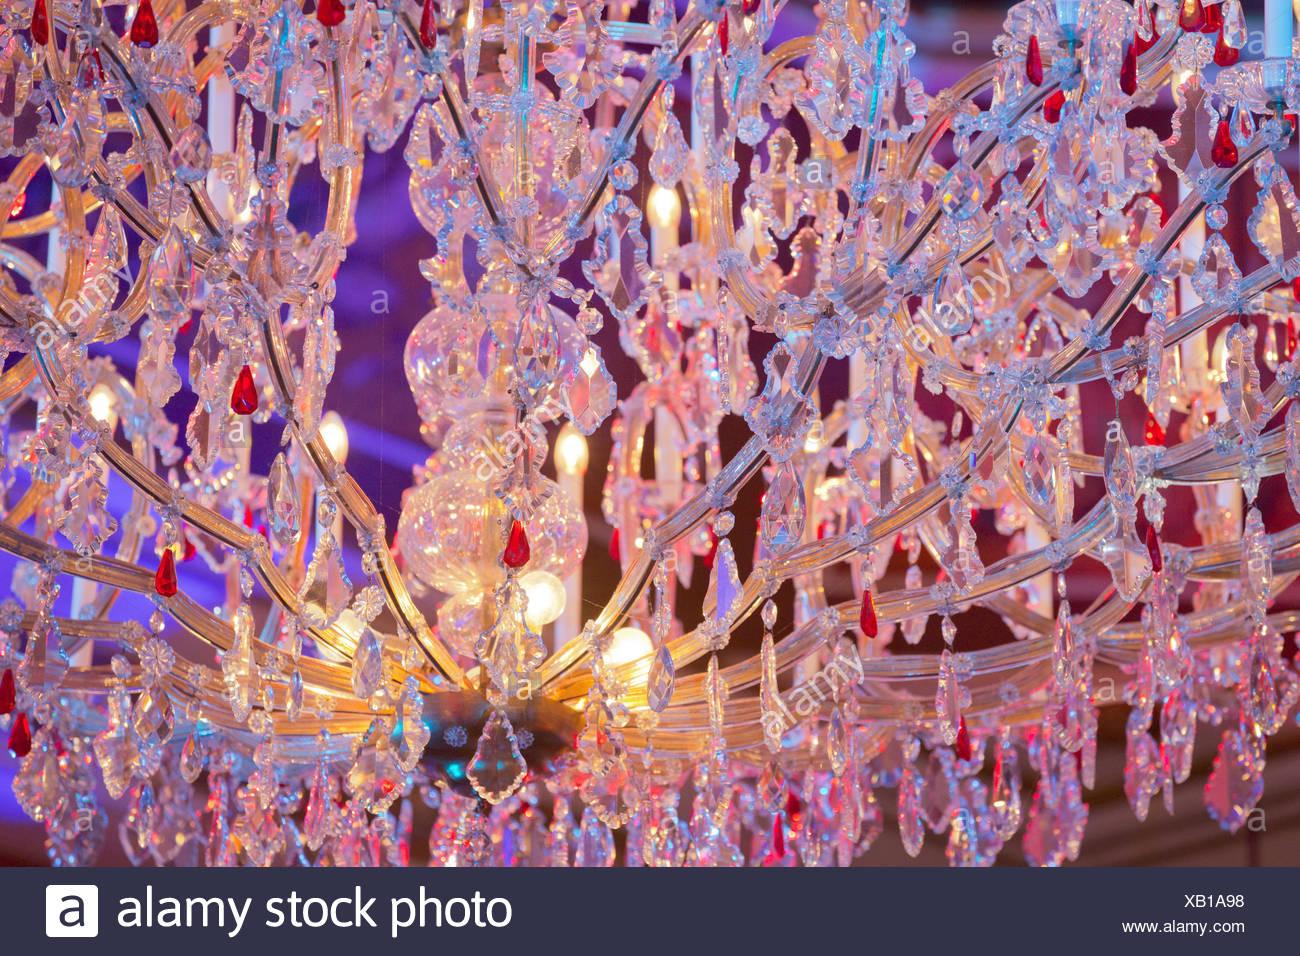 Crystal candlestick, Vienna, Austria - Stock Image